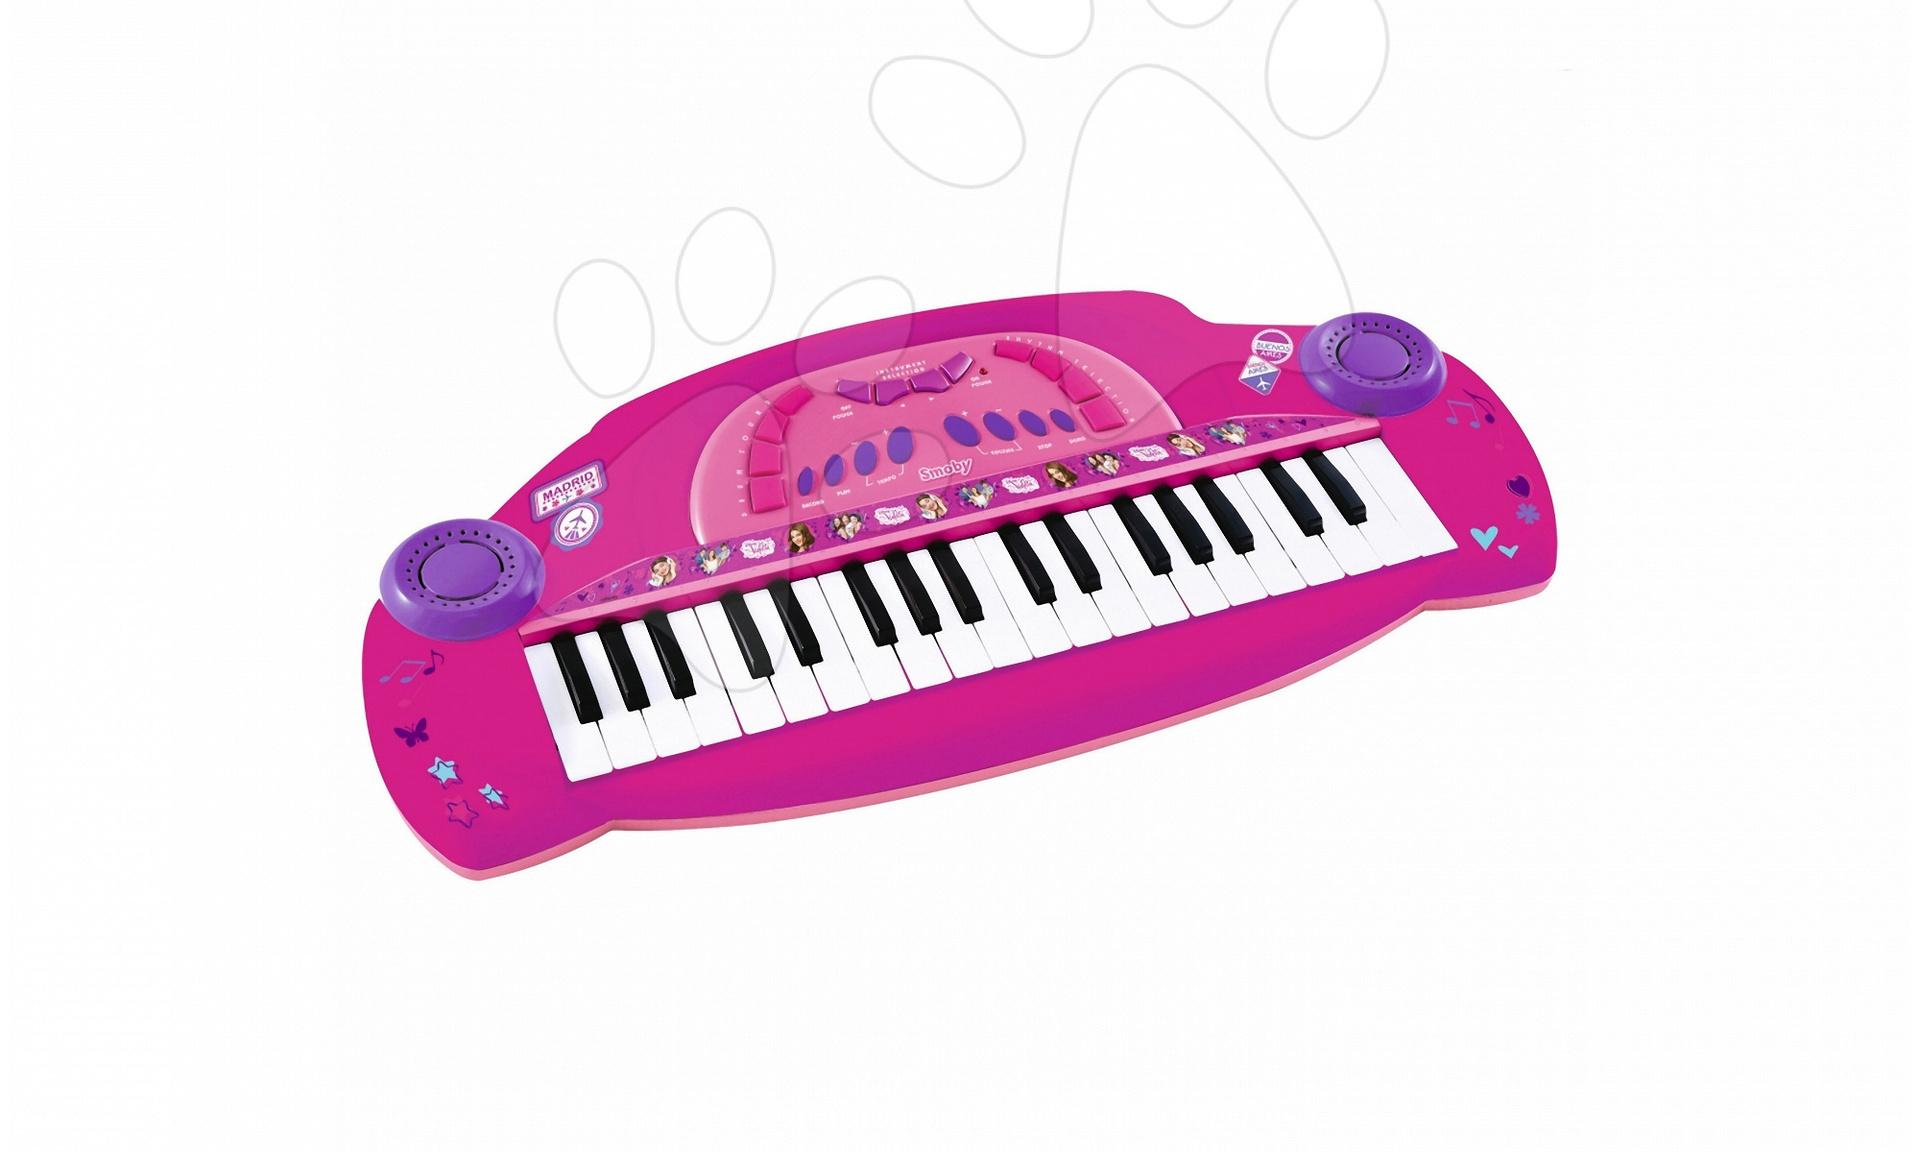 Detské hudobné nástroje - Piano Violetta Smoby elektronické ružové